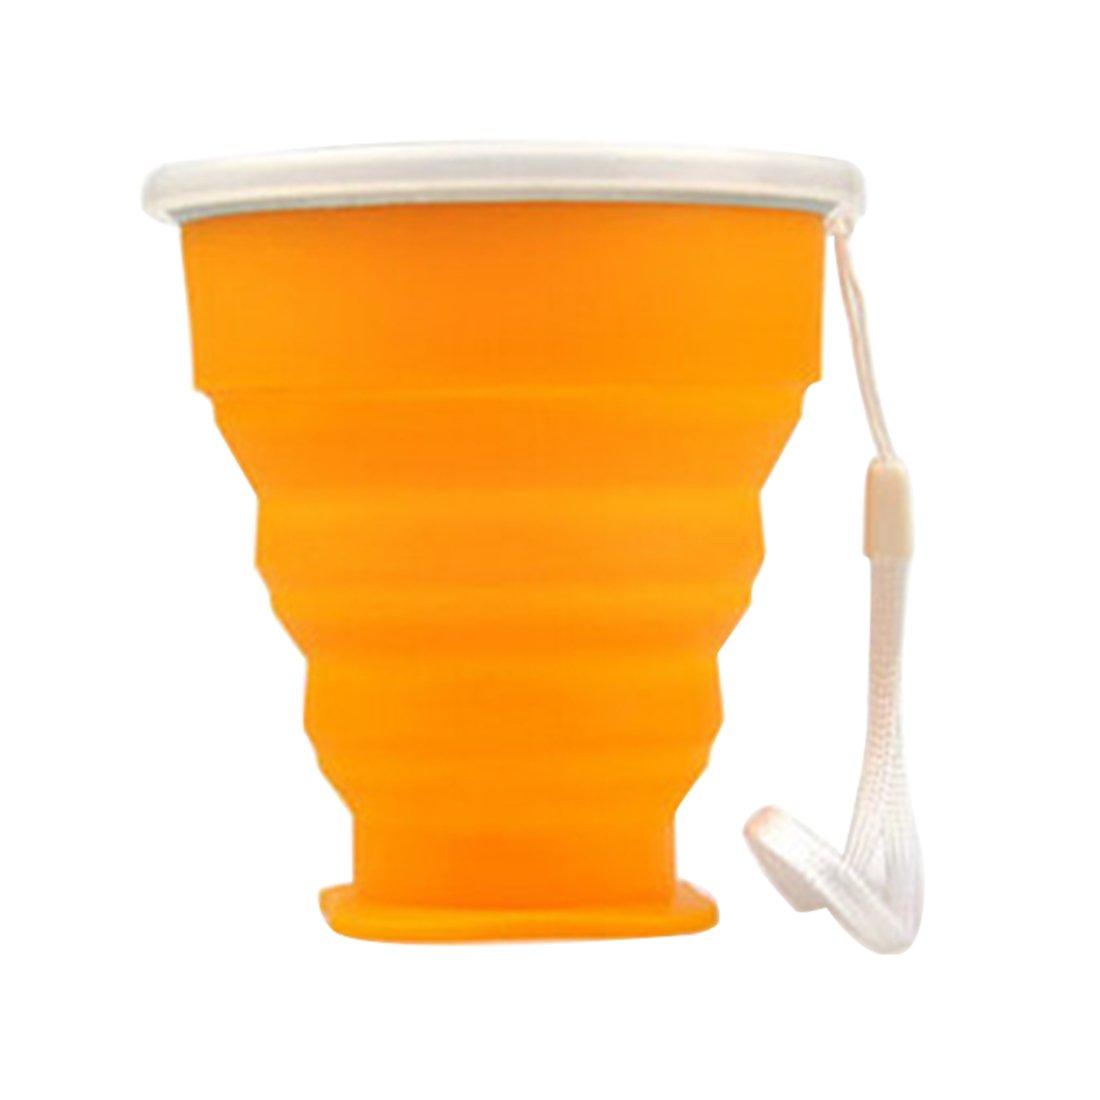 naranja. retr/áctil Vaso plegable de silicona con cuerda telesc/ópico 200/ml